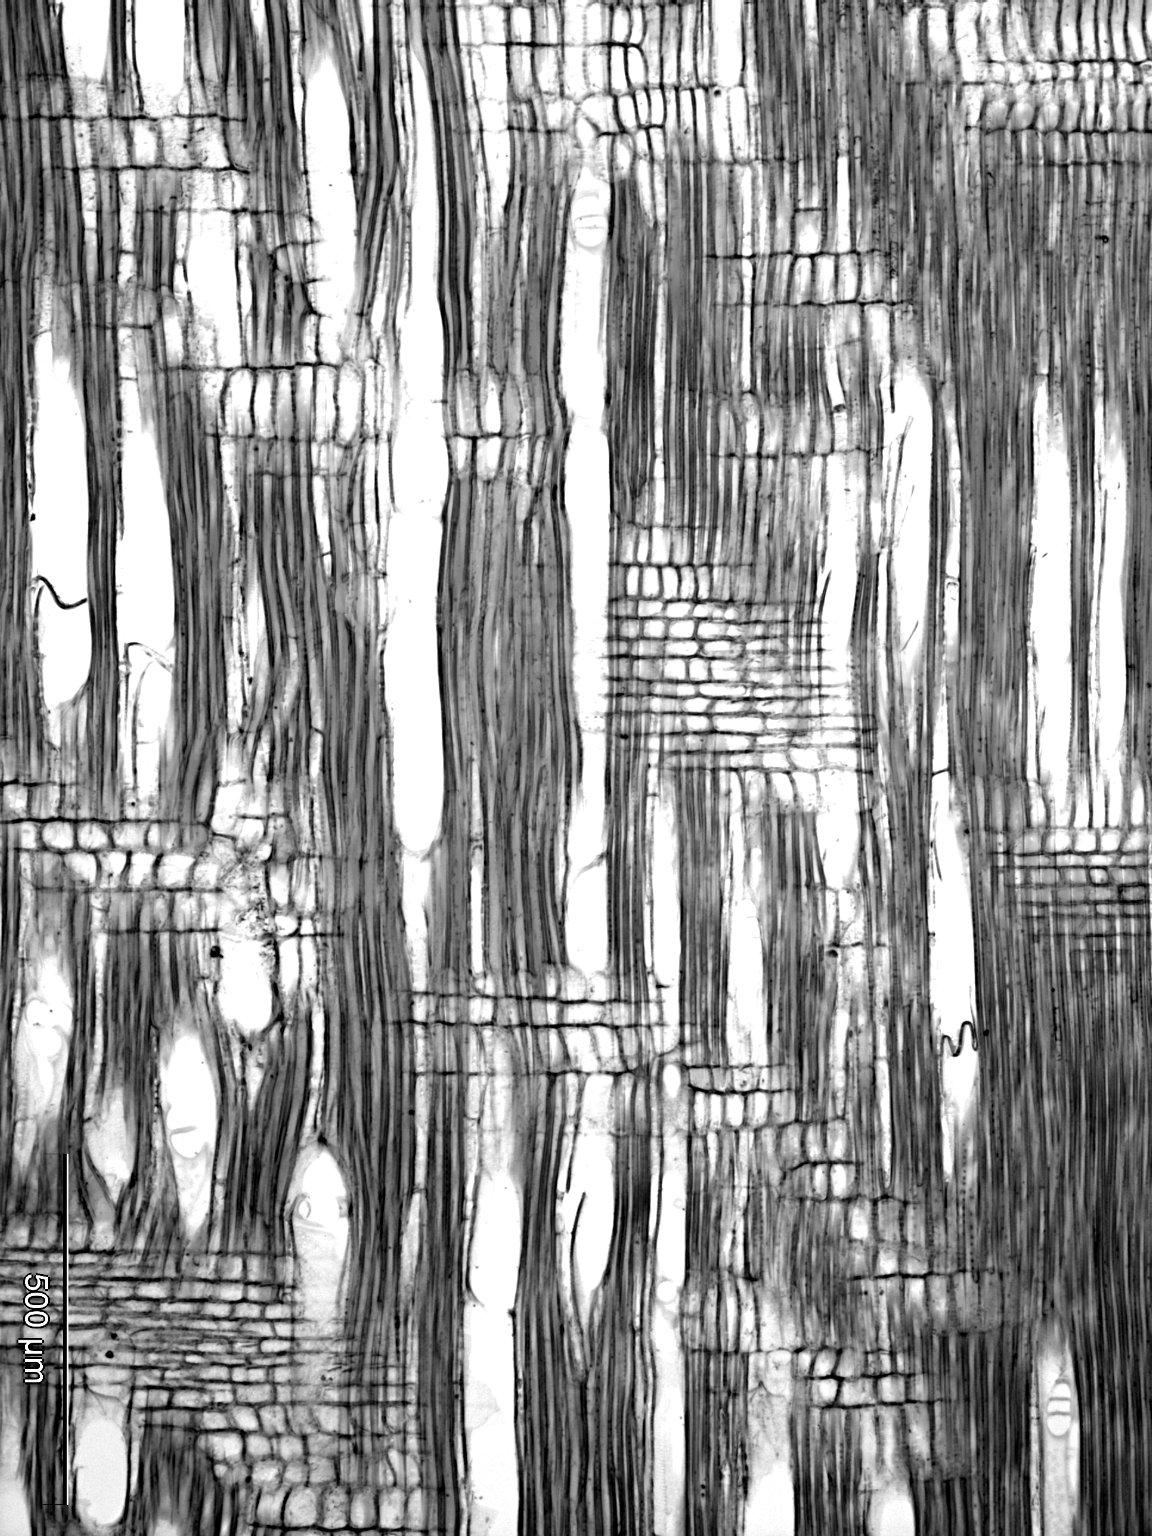 CARDIOPTERIDACEAE Leptaulus daphnoides